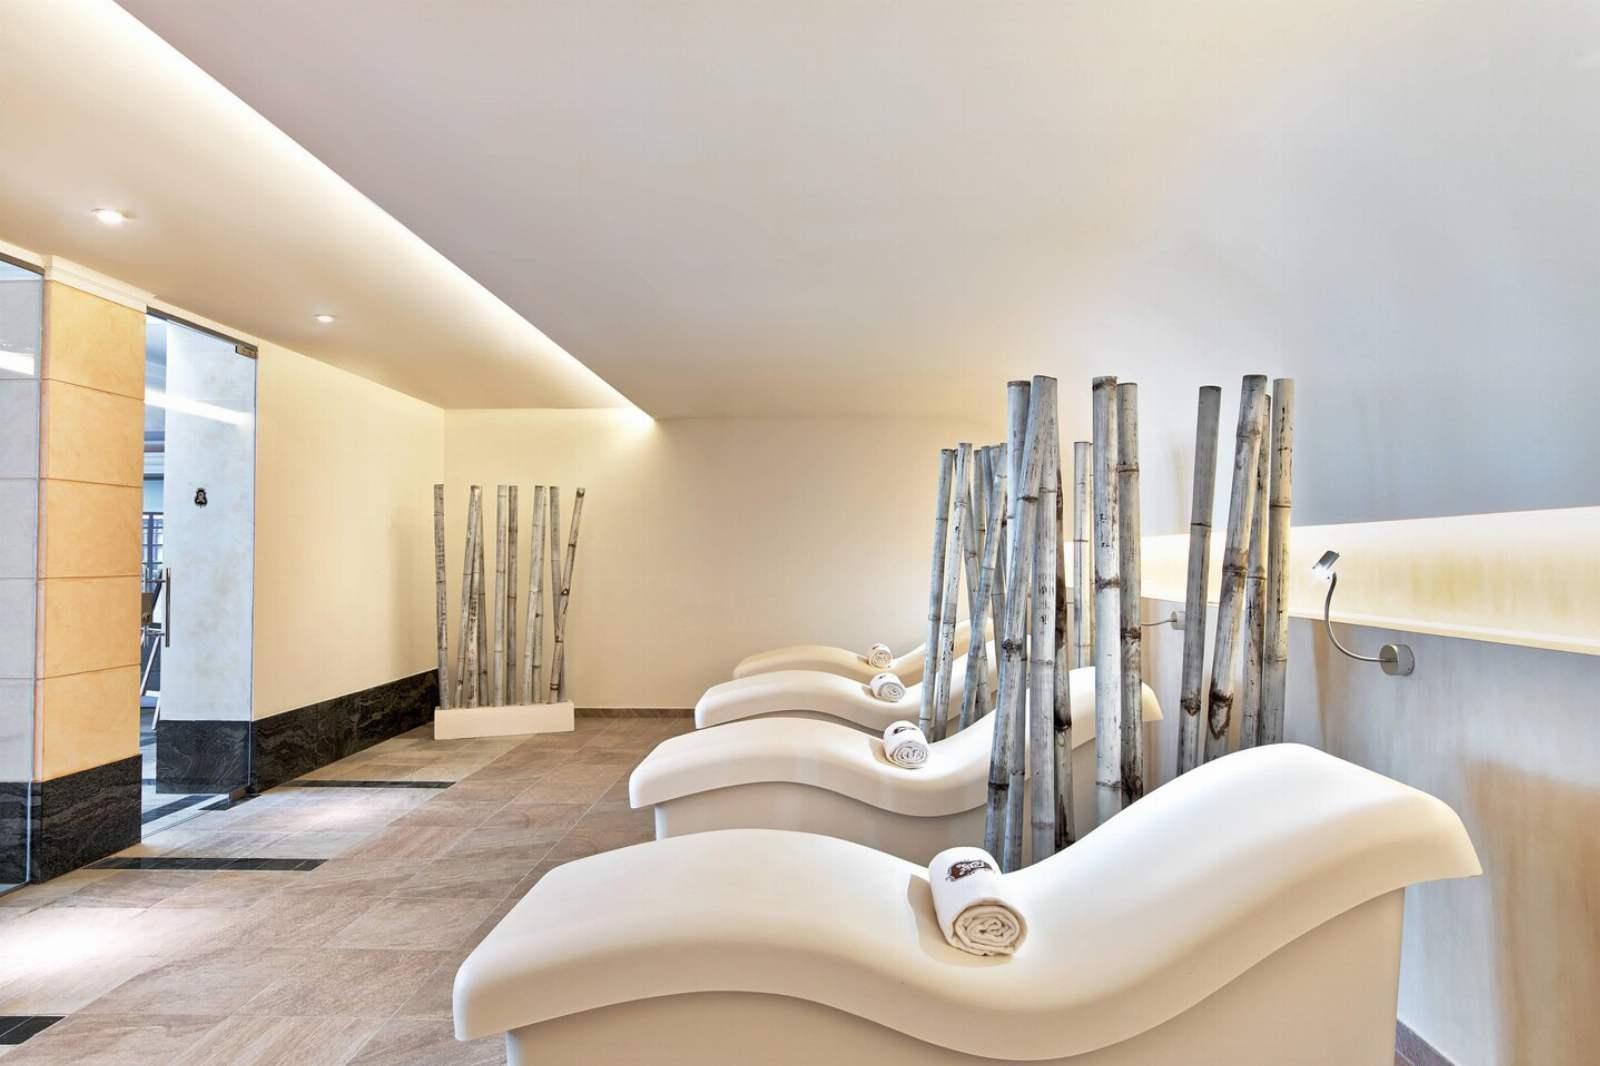 St. Regis Mardavall Resort - Arabella Spa Relaxation Area